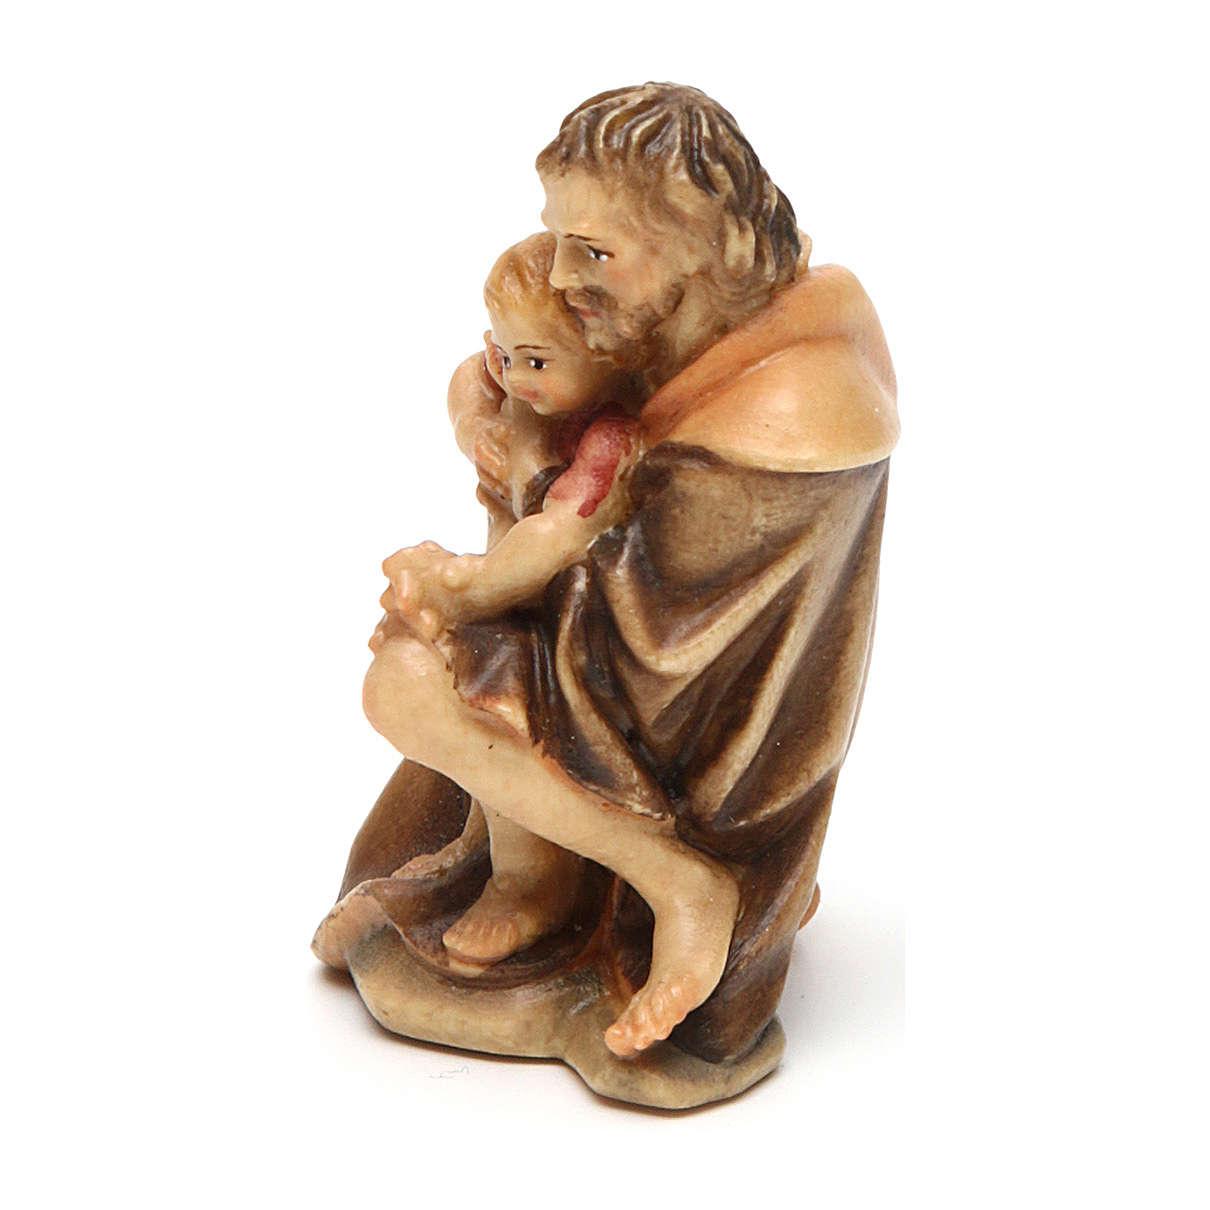 Pastore inginocchiato con bambino presepe Original legno Valgardena 10 cm 4